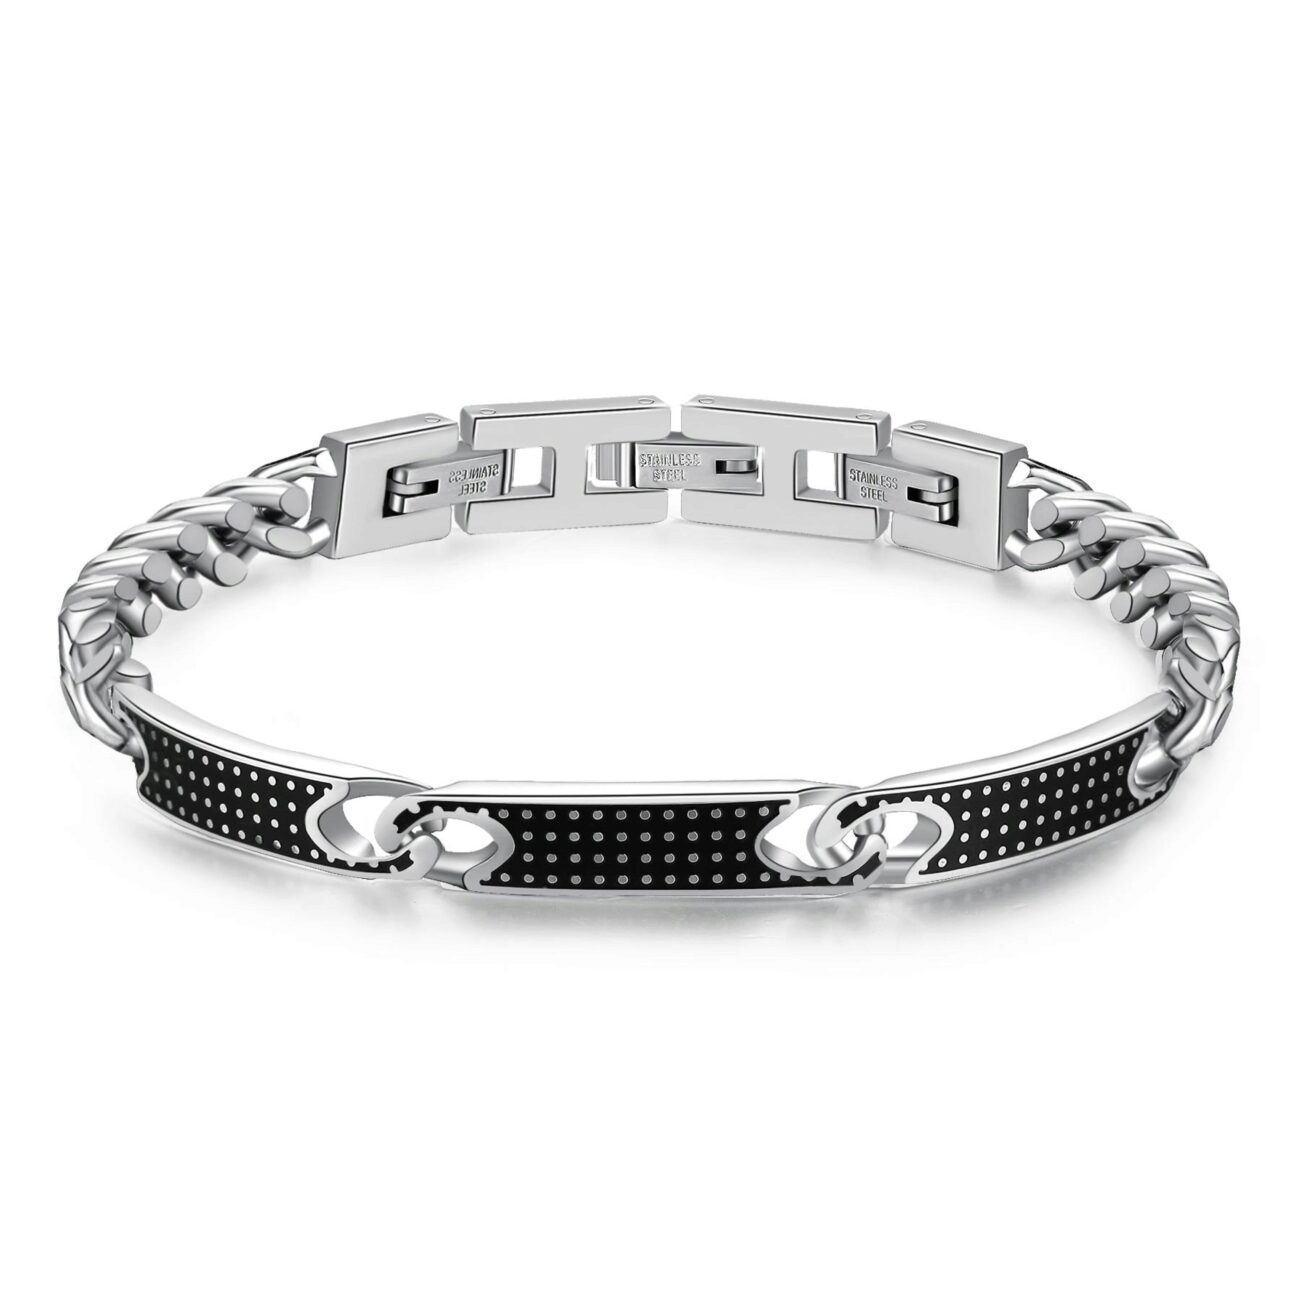 316L stainless steel chain bracelet with black enamel.